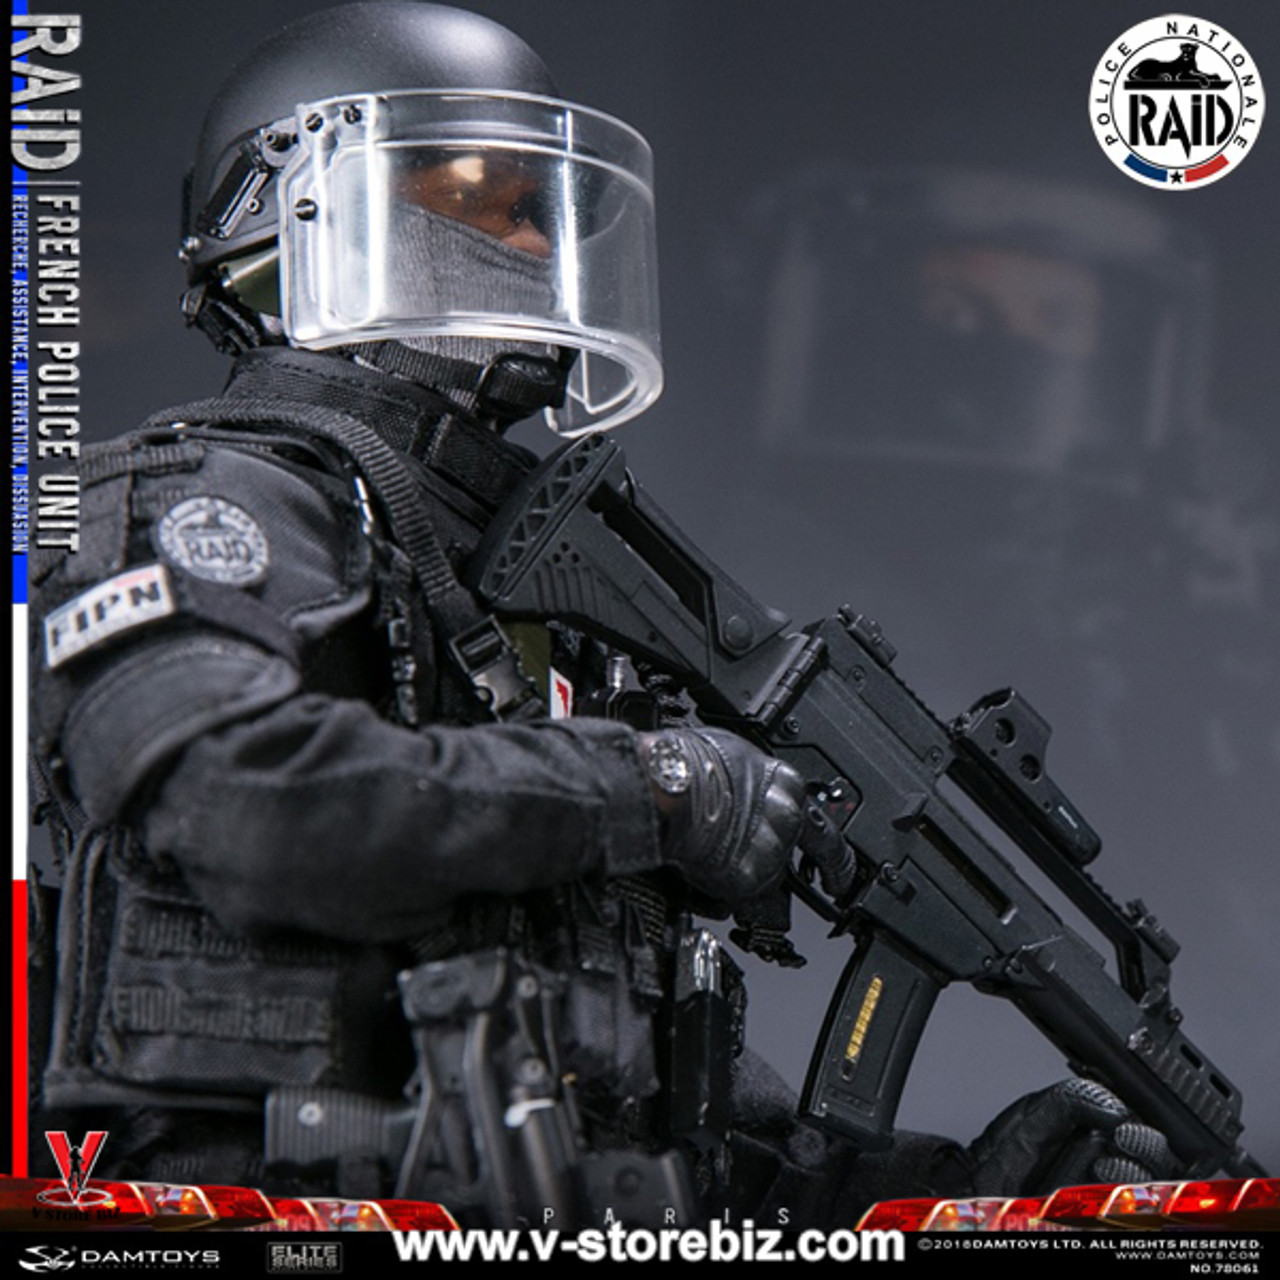 Dam DAMTOYS 78061 1//6 Scale FRENCH POLICE UNIT RAID IN PARIS MISB In Stock